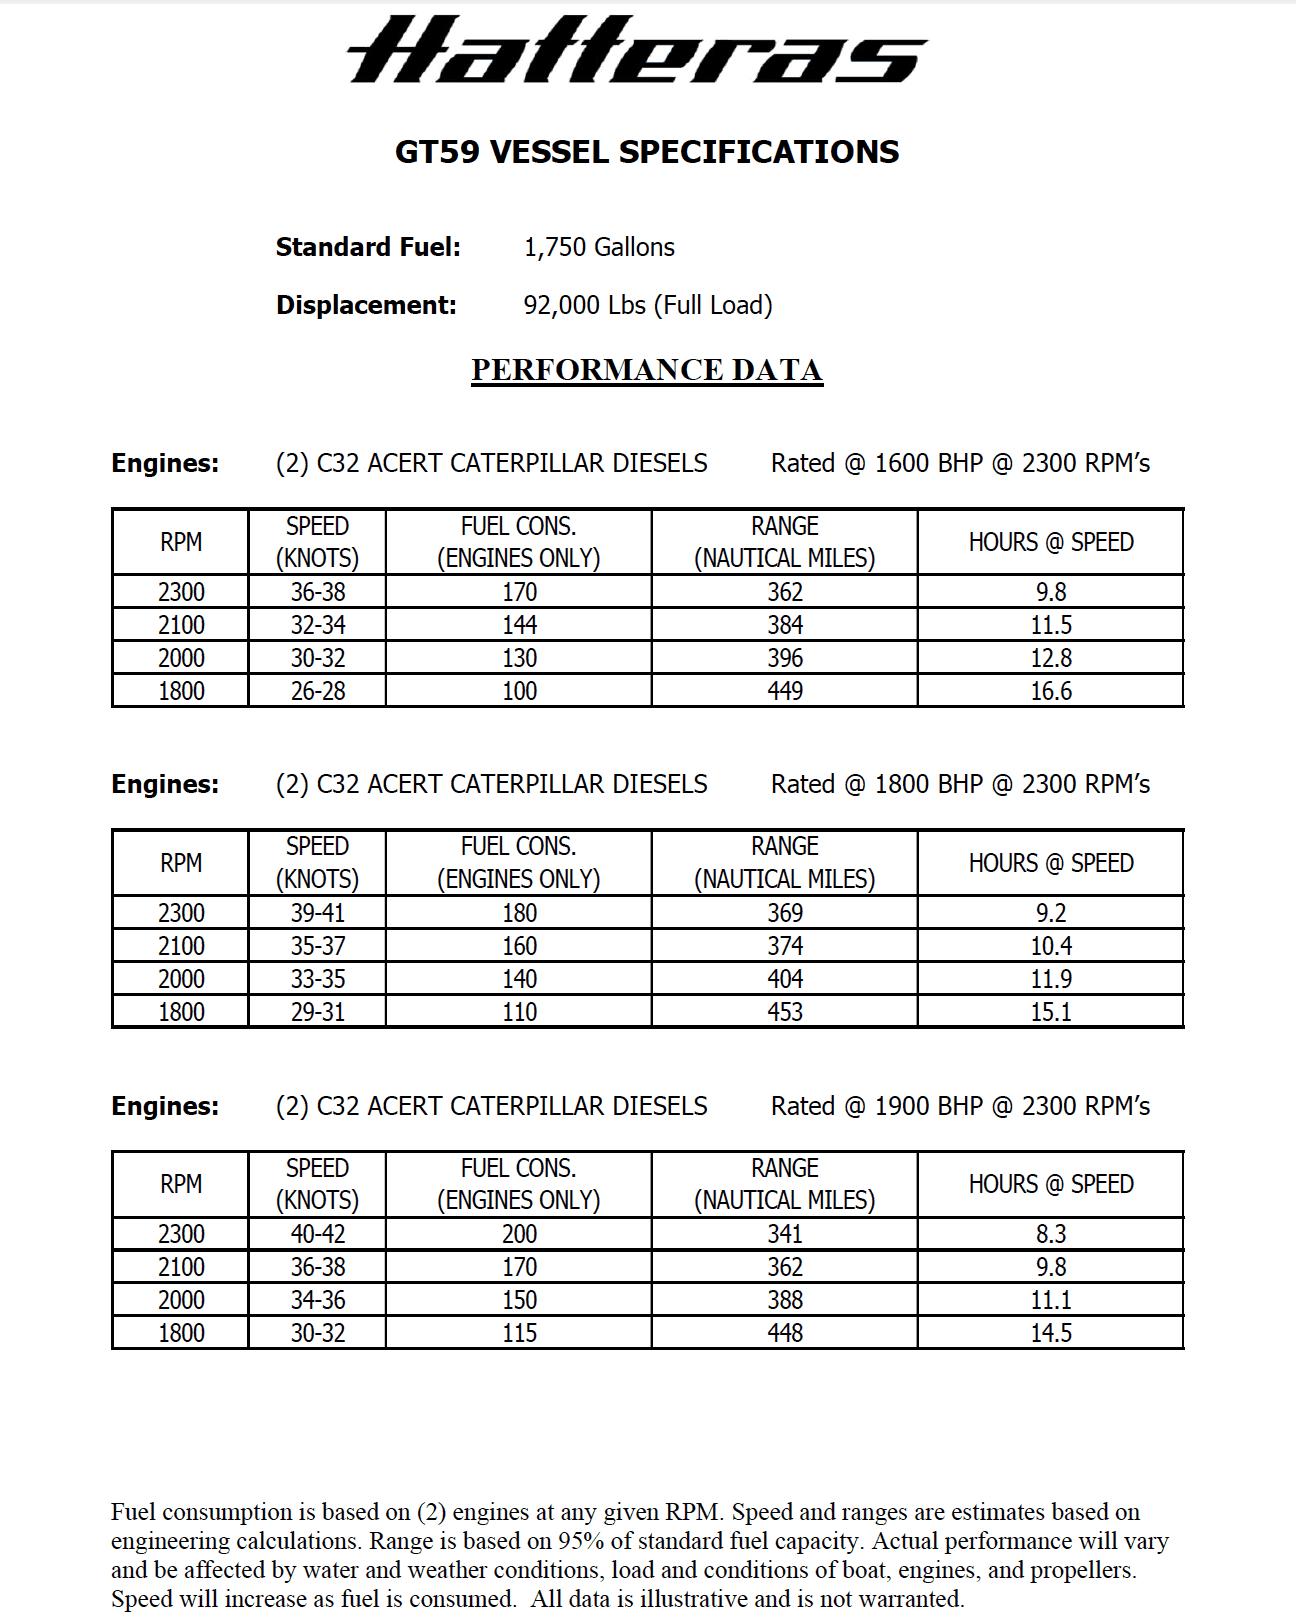 Hatteras GT59 Performance Data